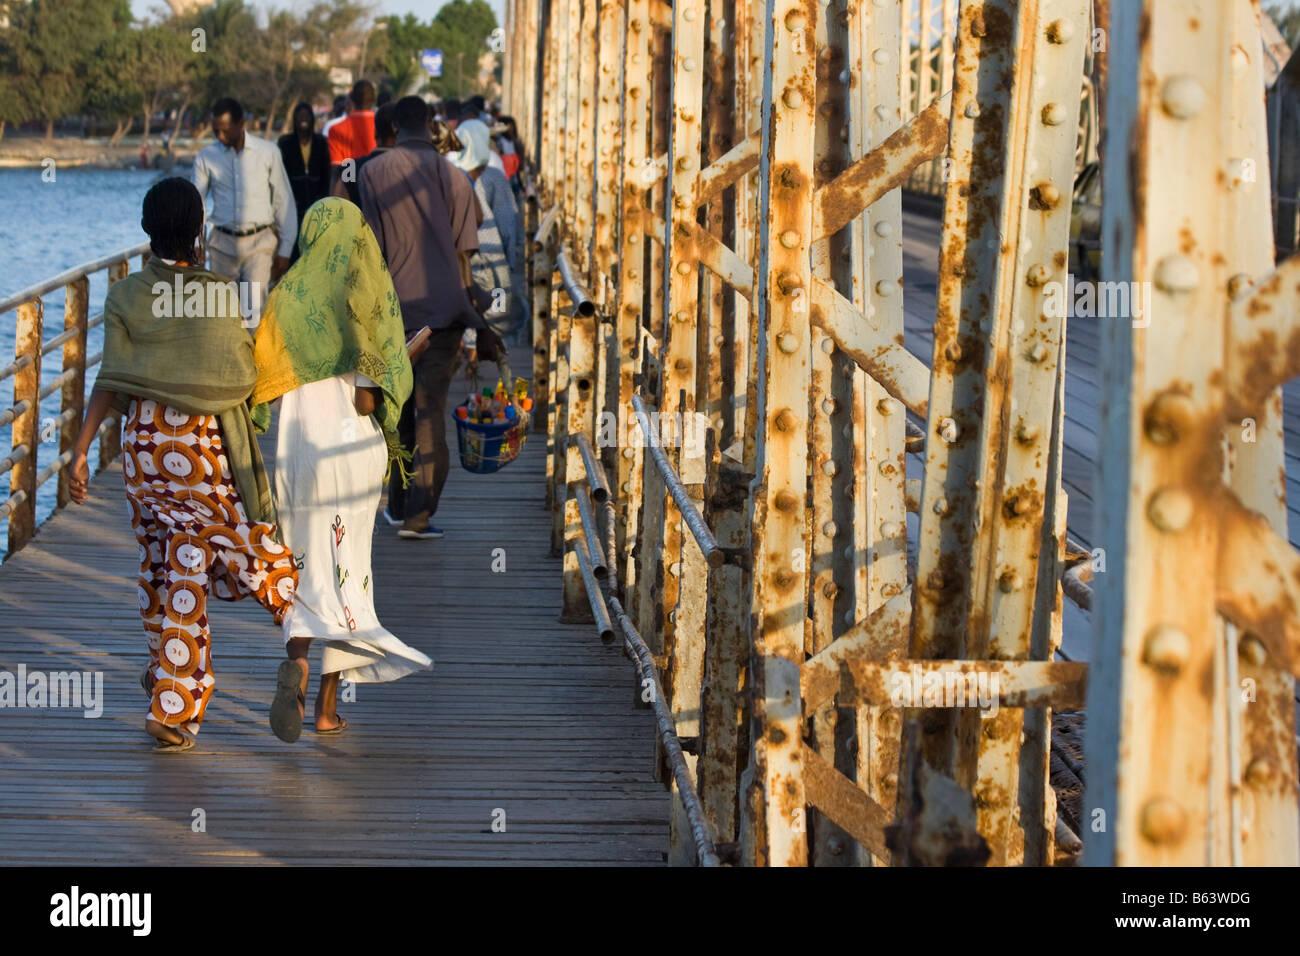 People Walking on the Faidherbe Bridge in St Louis in Senegal Africa - Stock Image